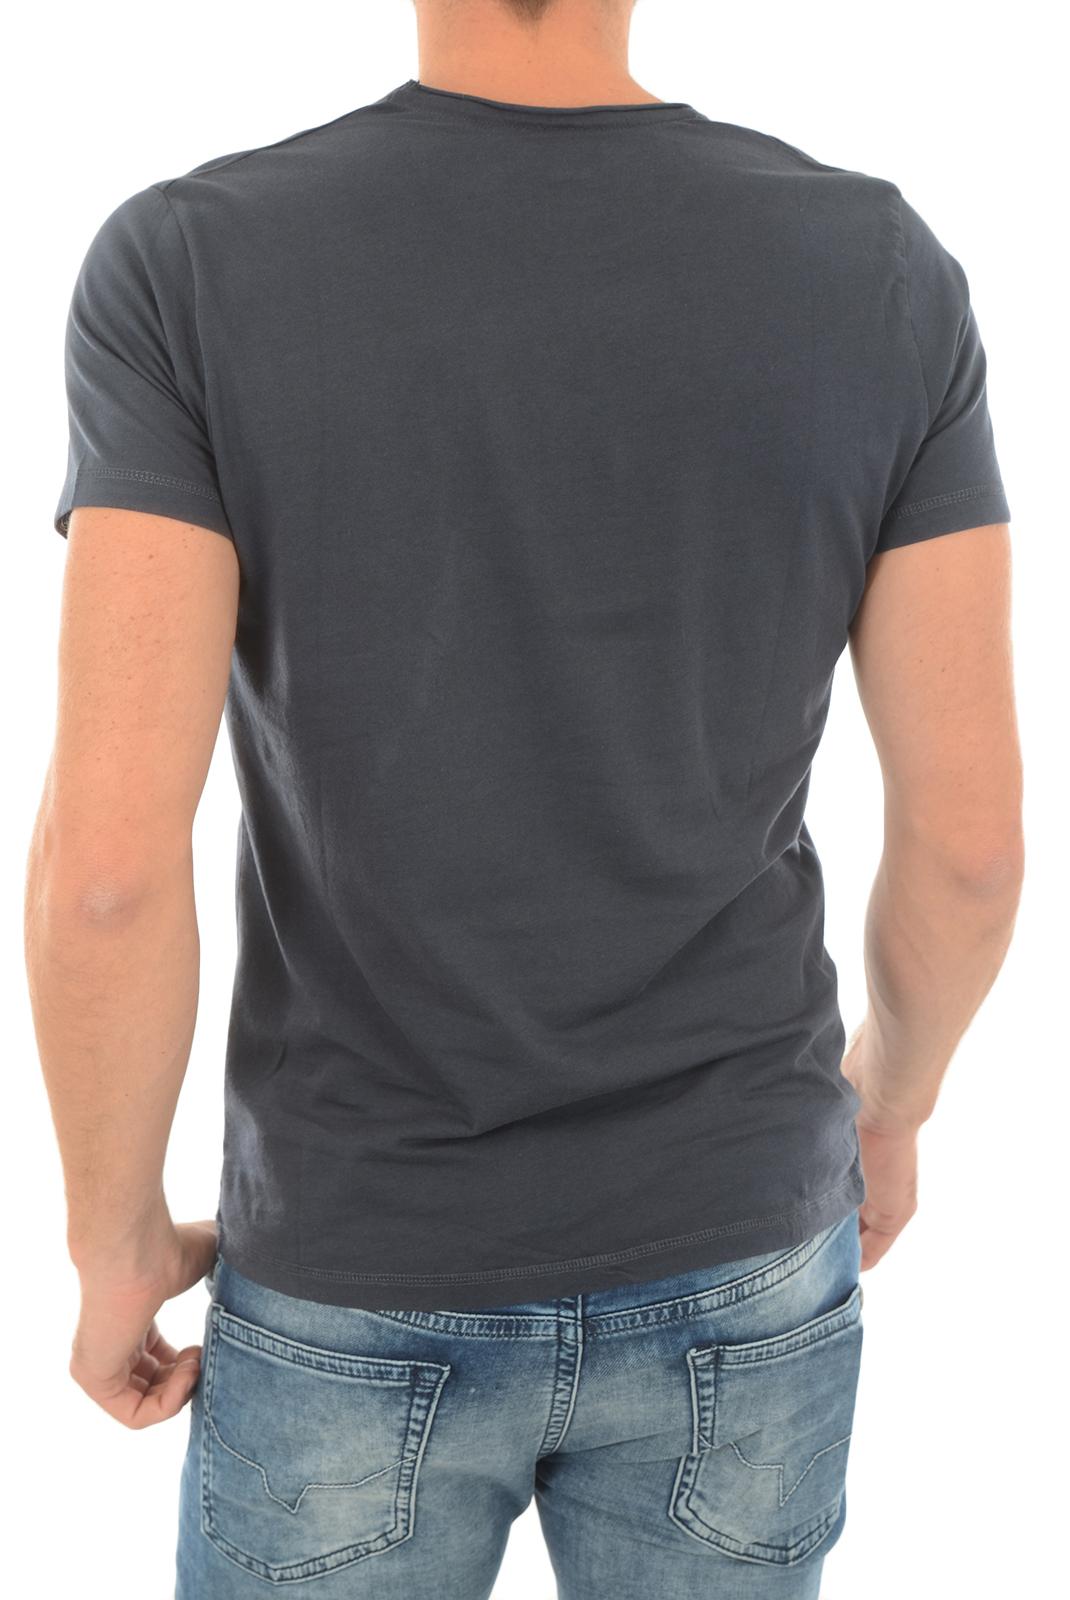 Tee-shirts  Pepe jeans PM502293 LUKE 587 VESPERTINE